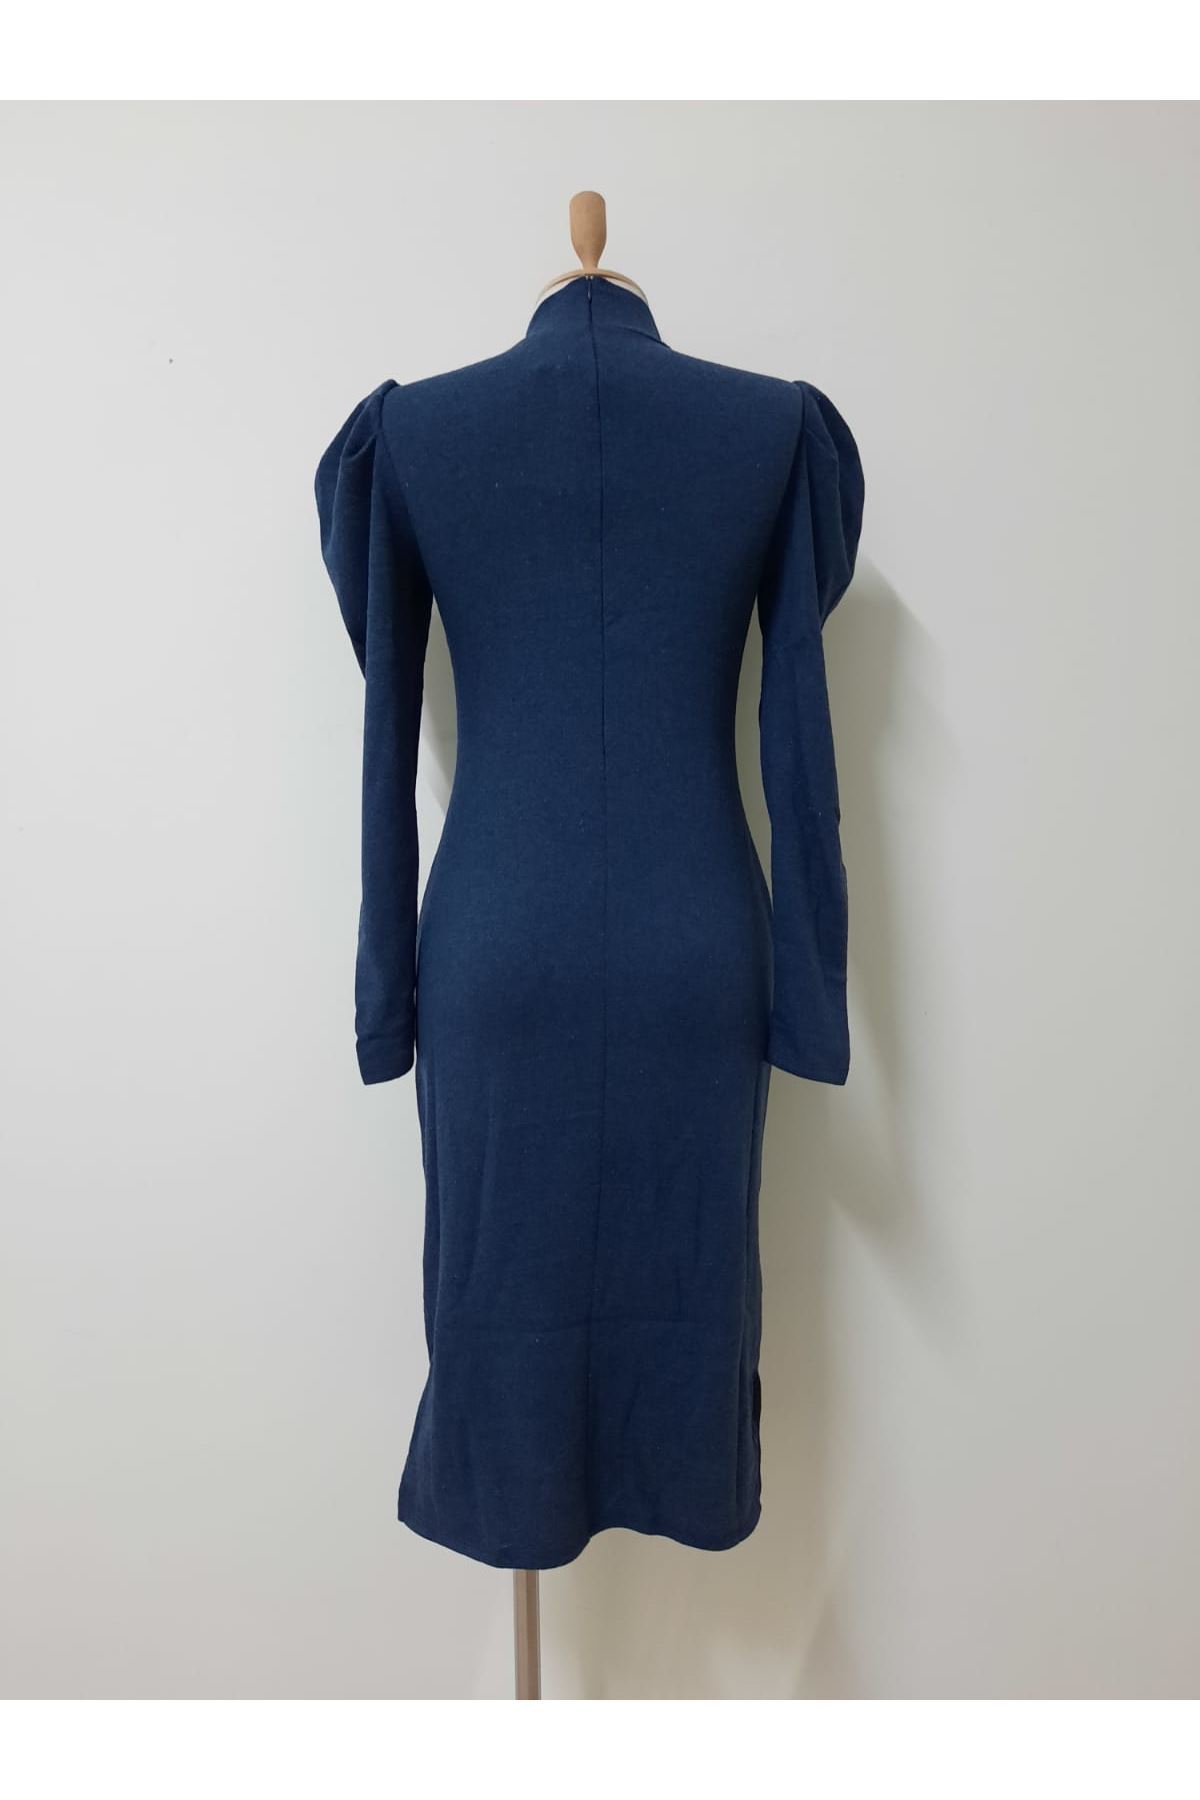 Prenses Omuz Triko Elbise - laci